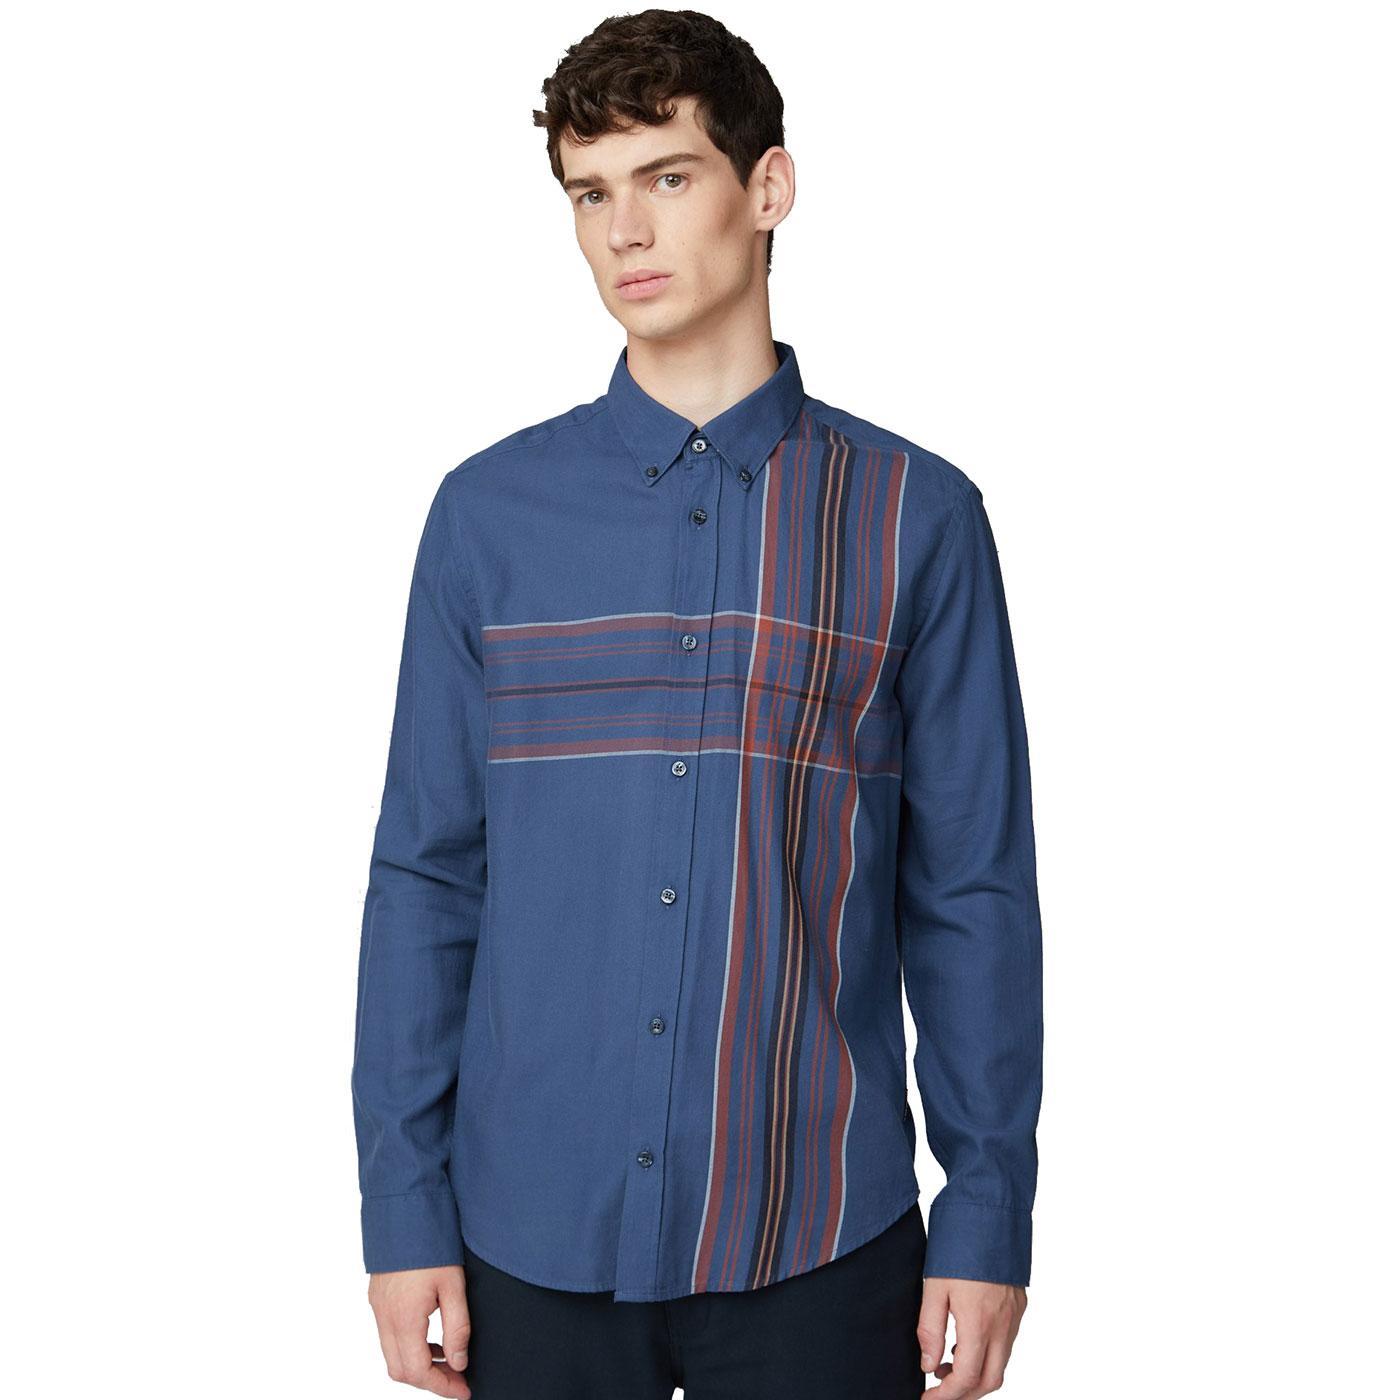 BEN SHERMAN Retro Mod Placed Stripe Plaid Shirt DB